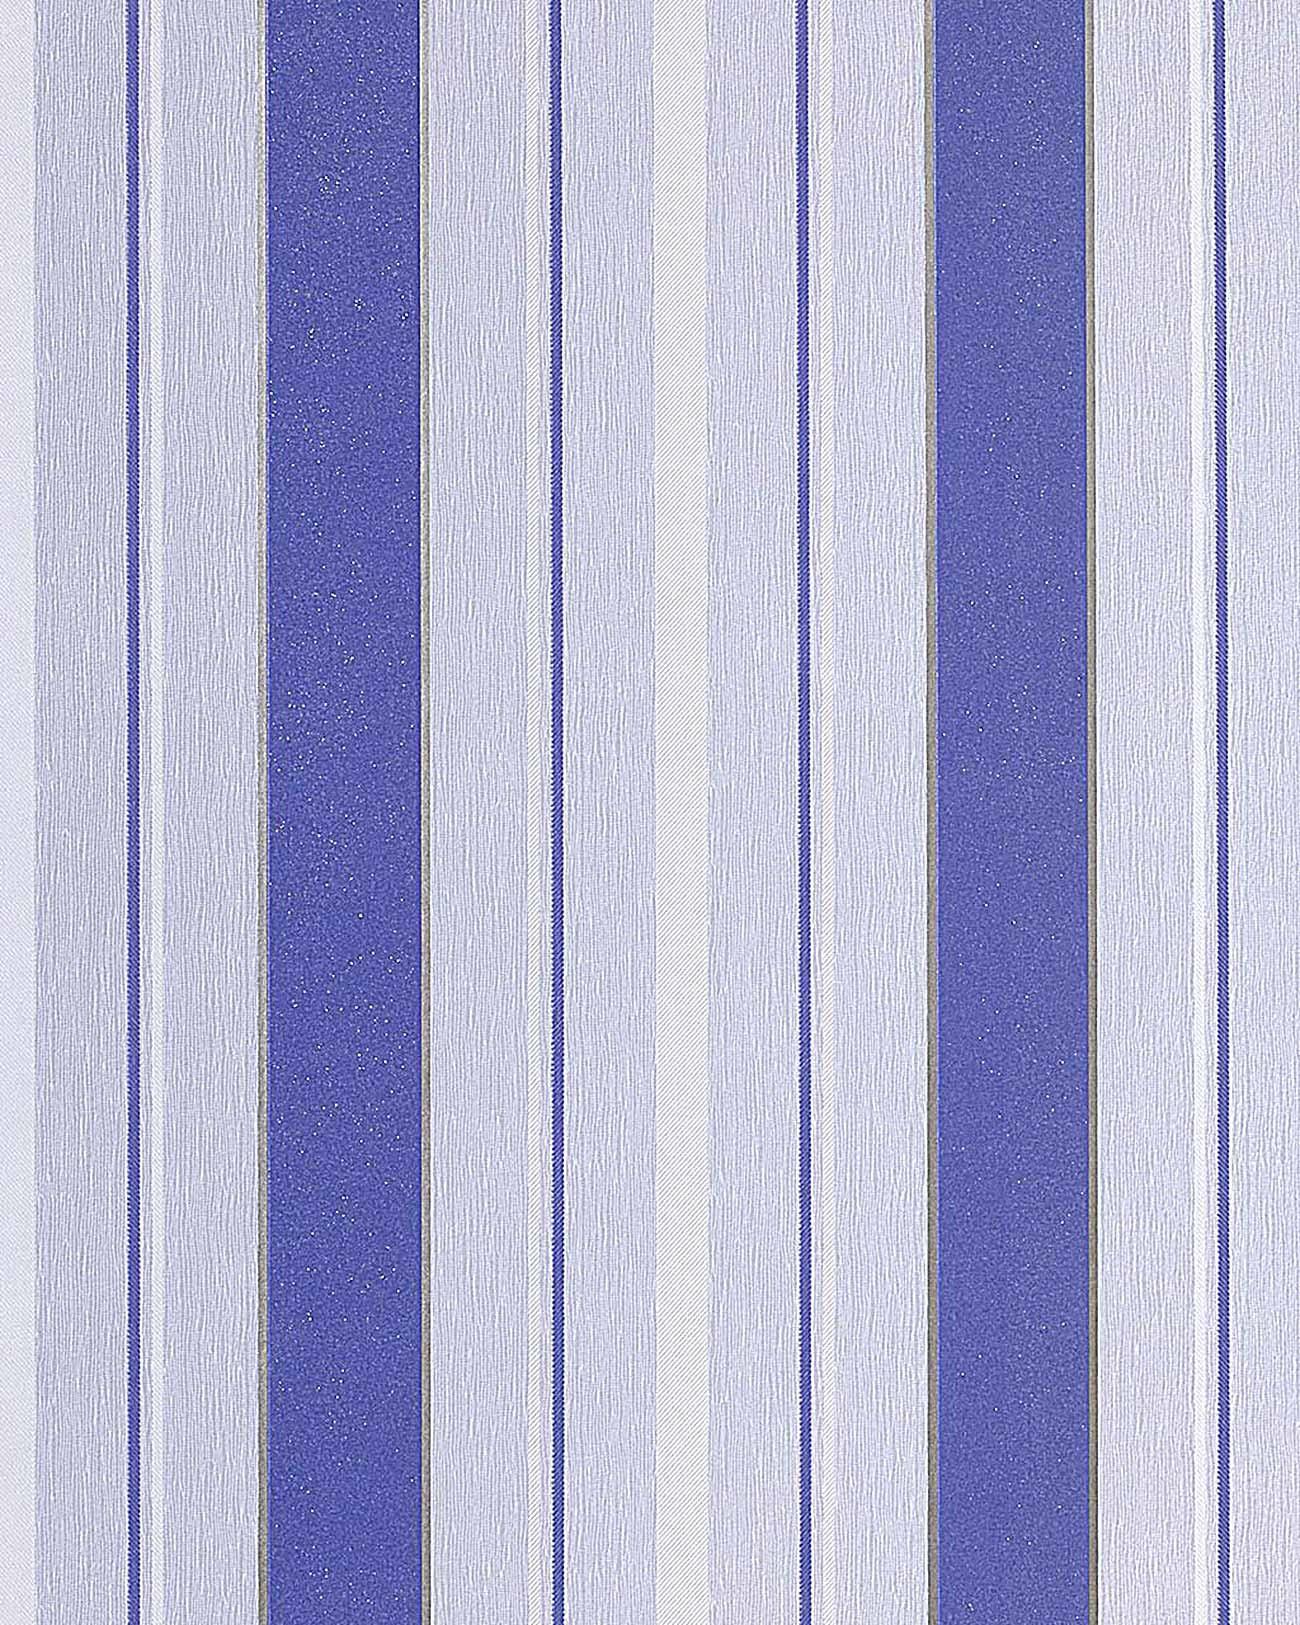 Carta da parati a righe con disegno a strisce edem 069 22 for Carta parati a righe